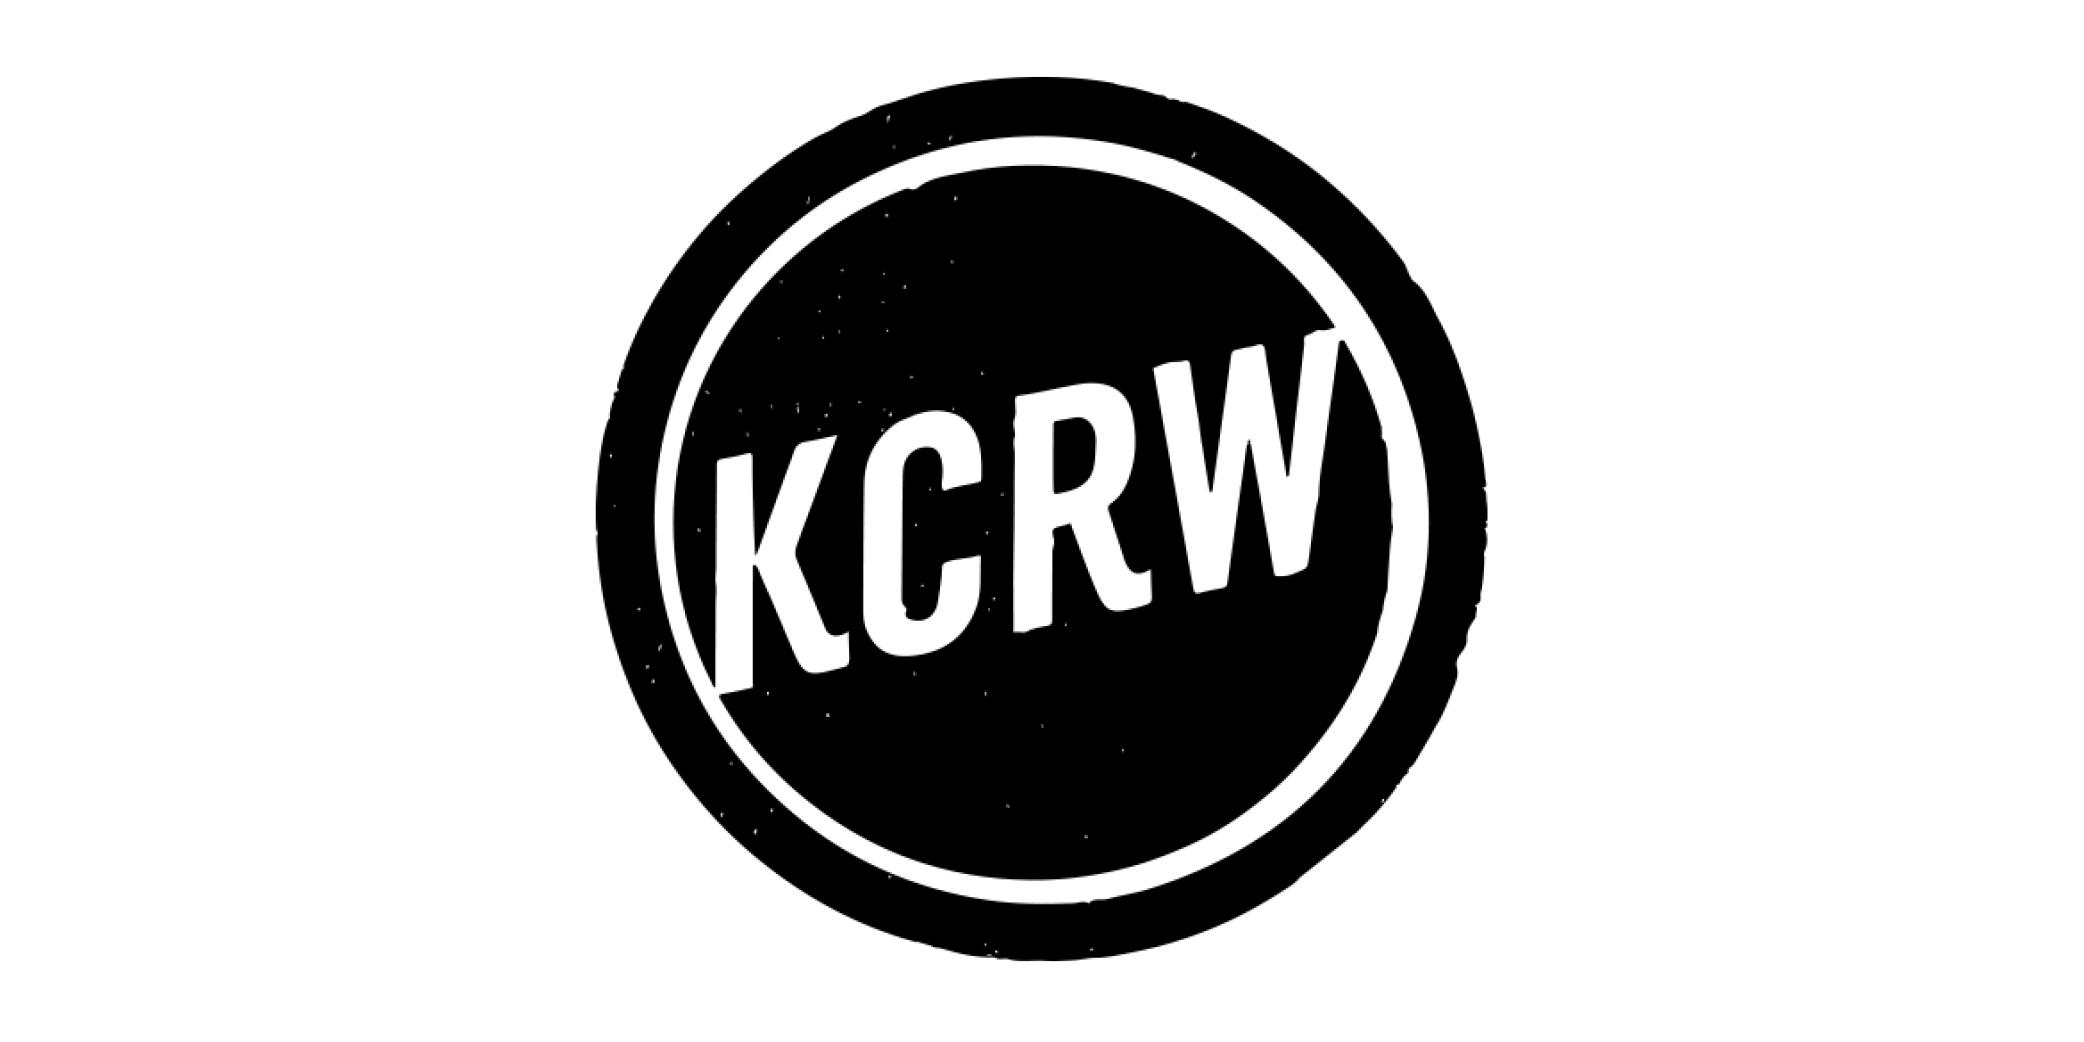 KCRW_C